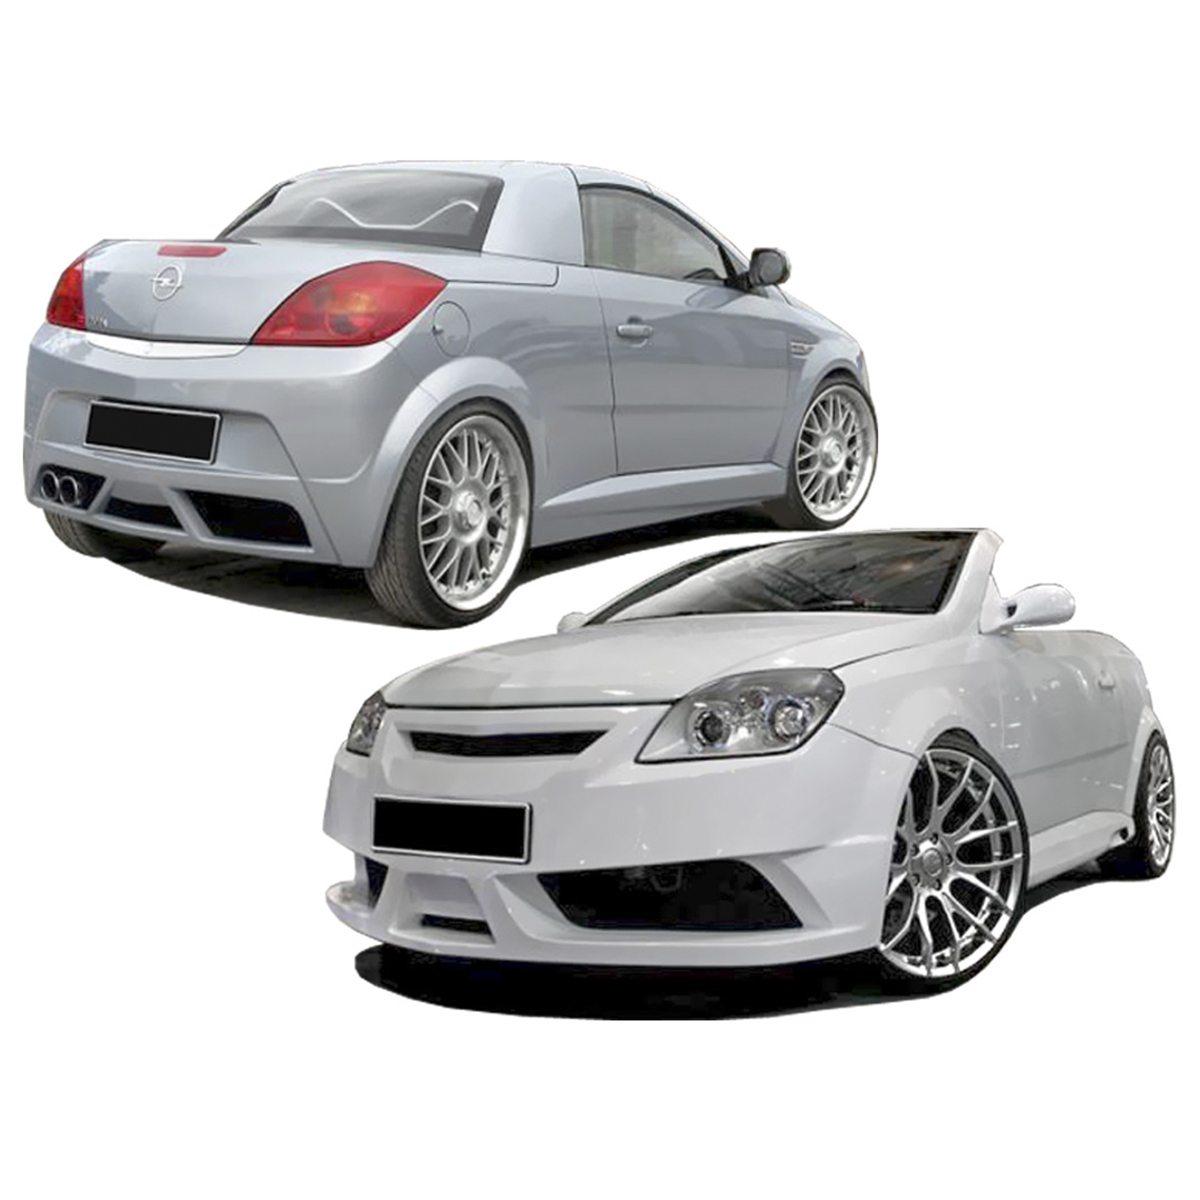 Opel-Tigra-TwinTop-FreeStyle-KIT-KTS070